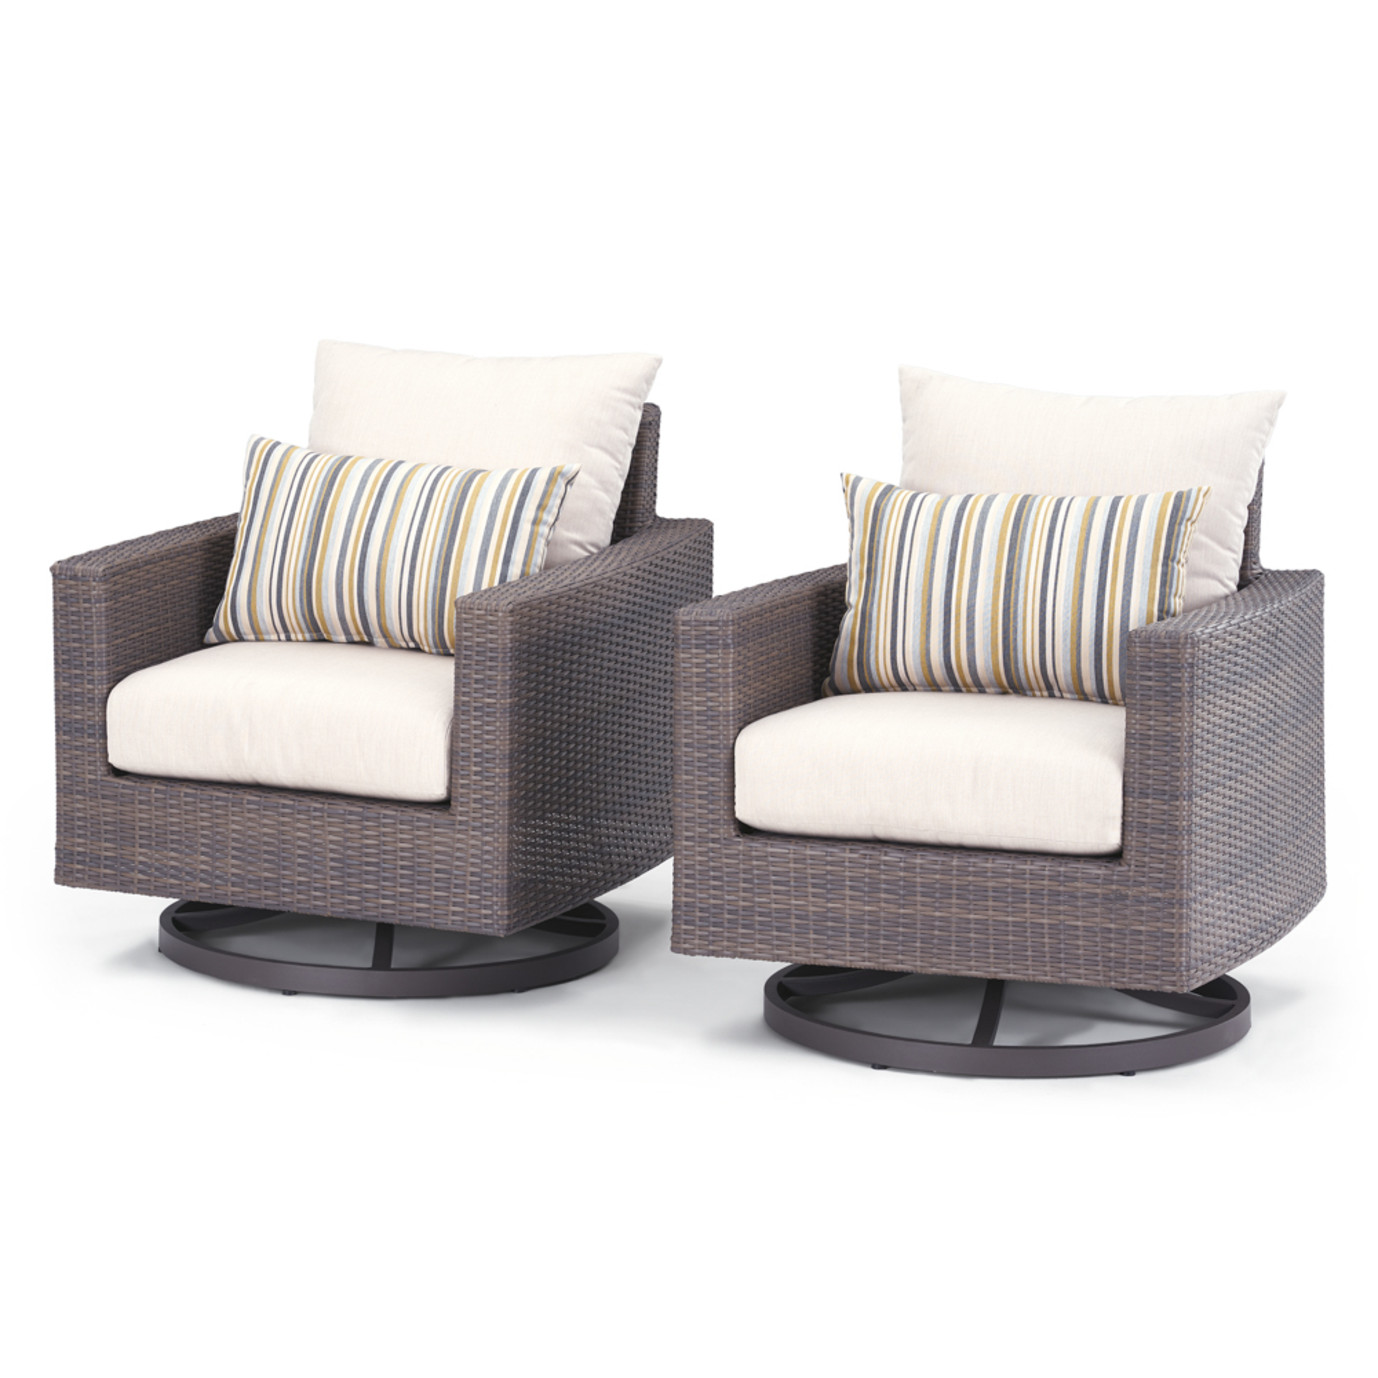 Milea™ Motion Club Chairs